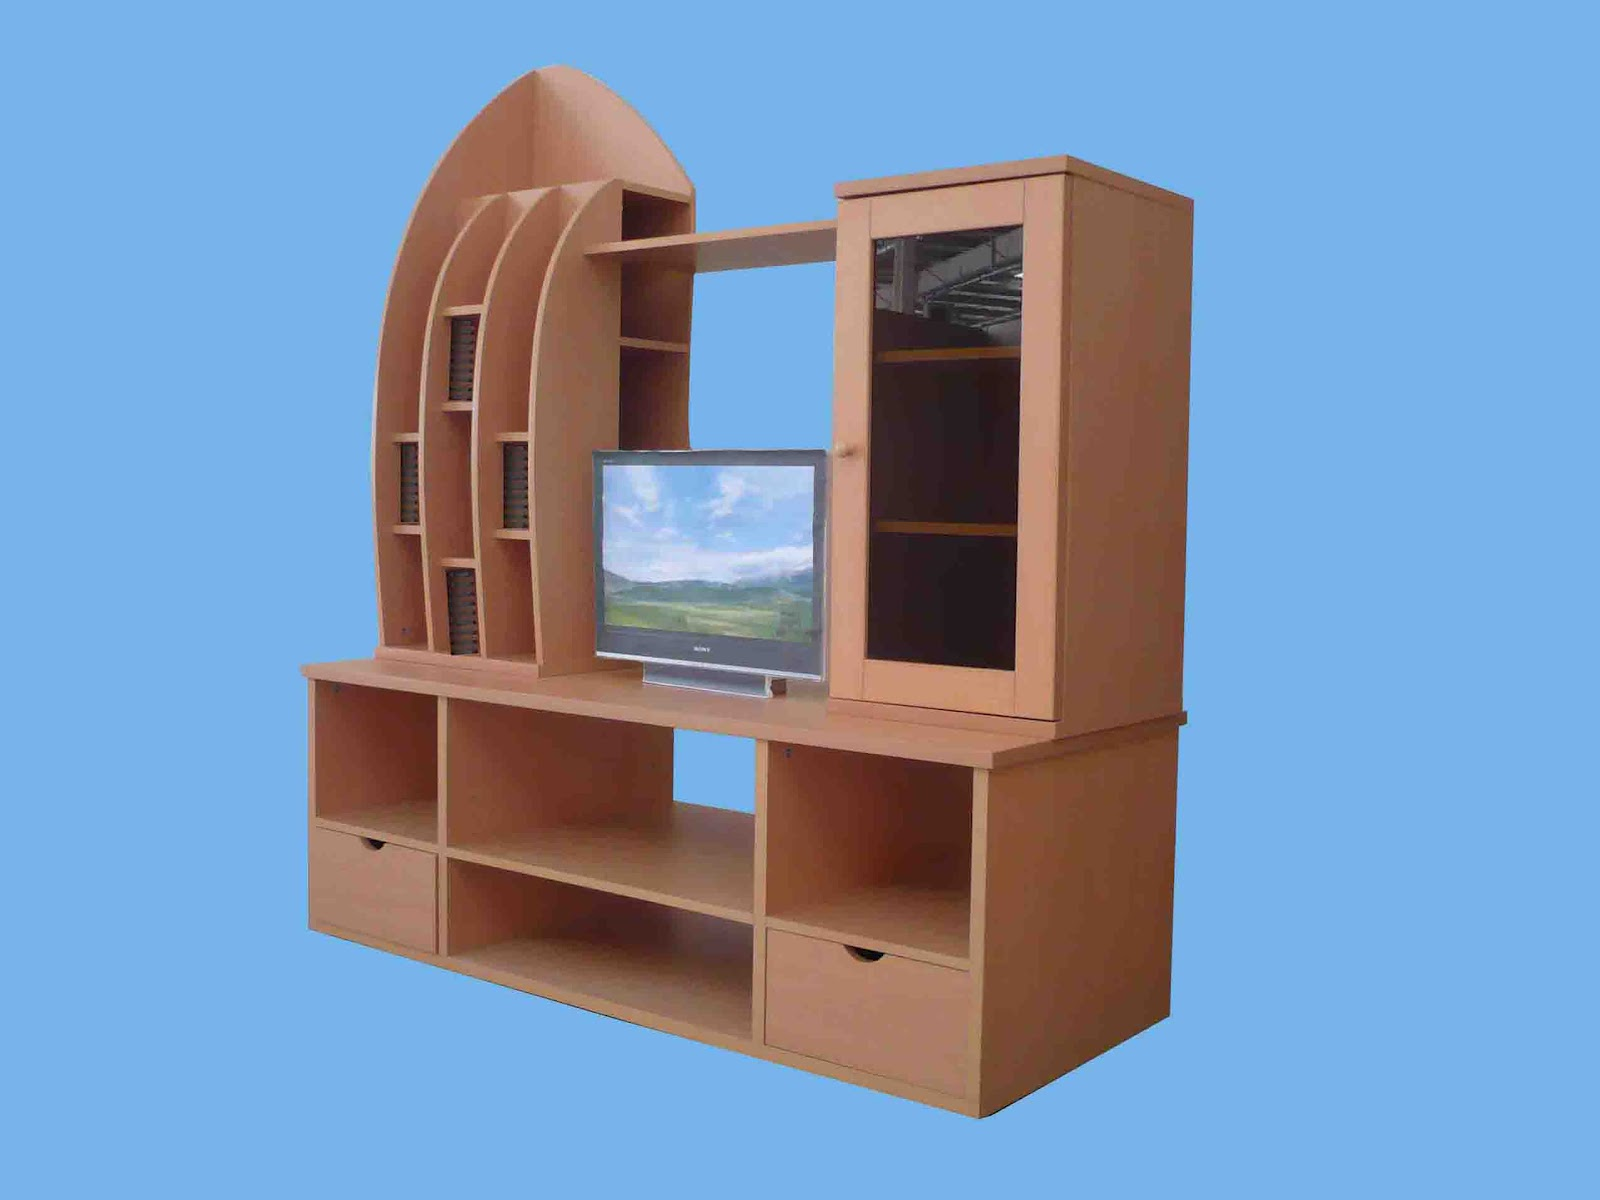 Furnitures Design lcd tv furnitures designs ideas. | best design home